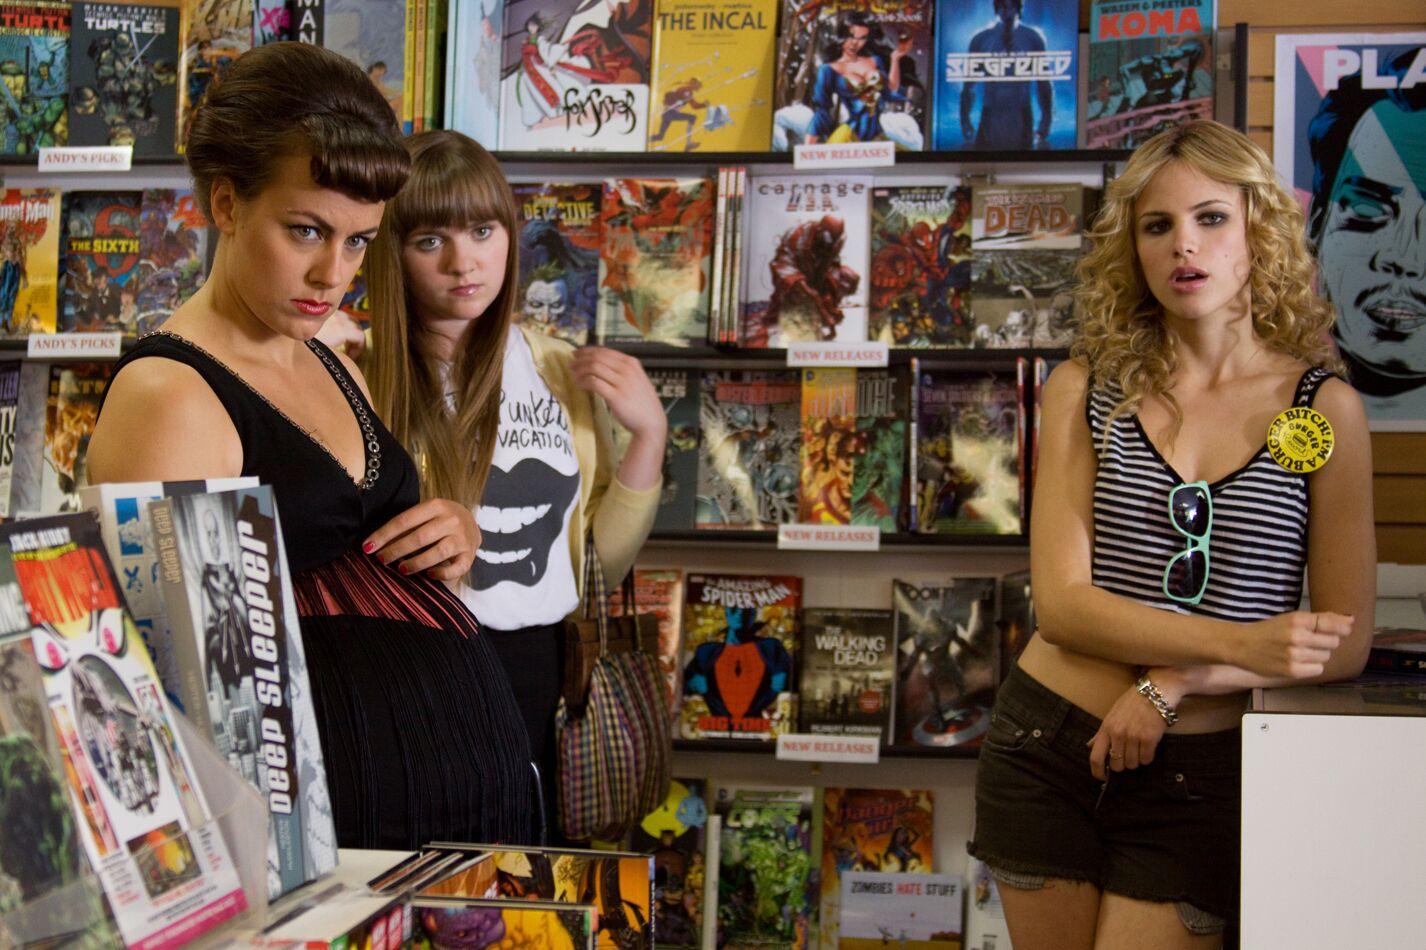 Thumbnail_Joans Day Out_teens at comic store.jpg